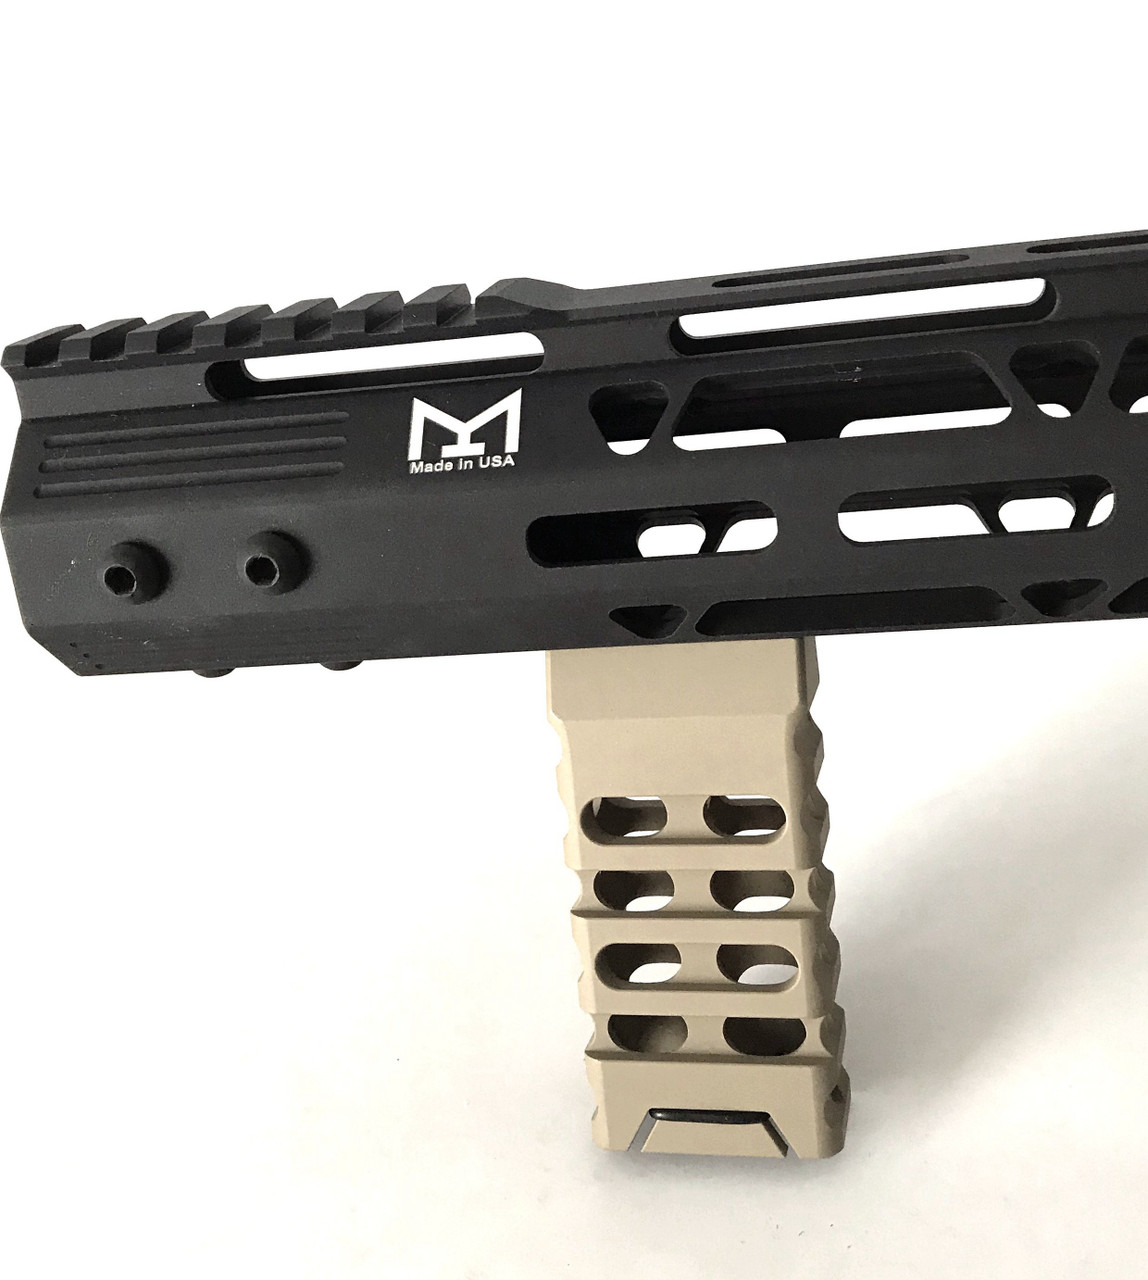 US fit M-lok Handguard Grip Skeletonized Vertical Angled Foregrip  for Rifle Alu